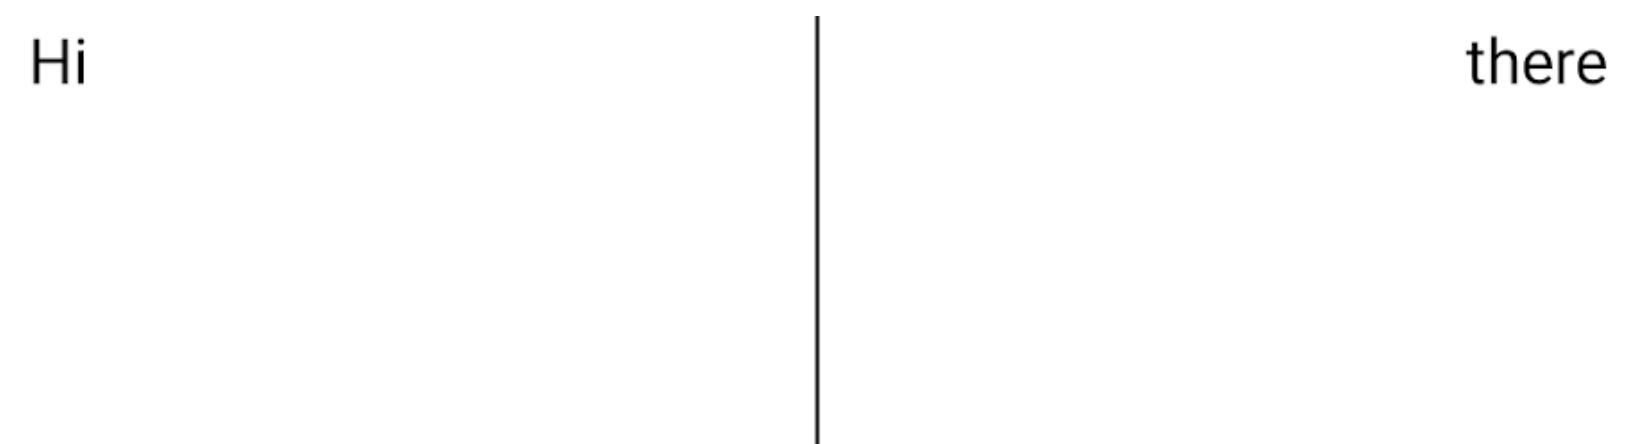 Dua elemen teks berdampingan, dengan pemisah di antara keduanya, tetapi pemisah membentang di bawah bagian bawah teks